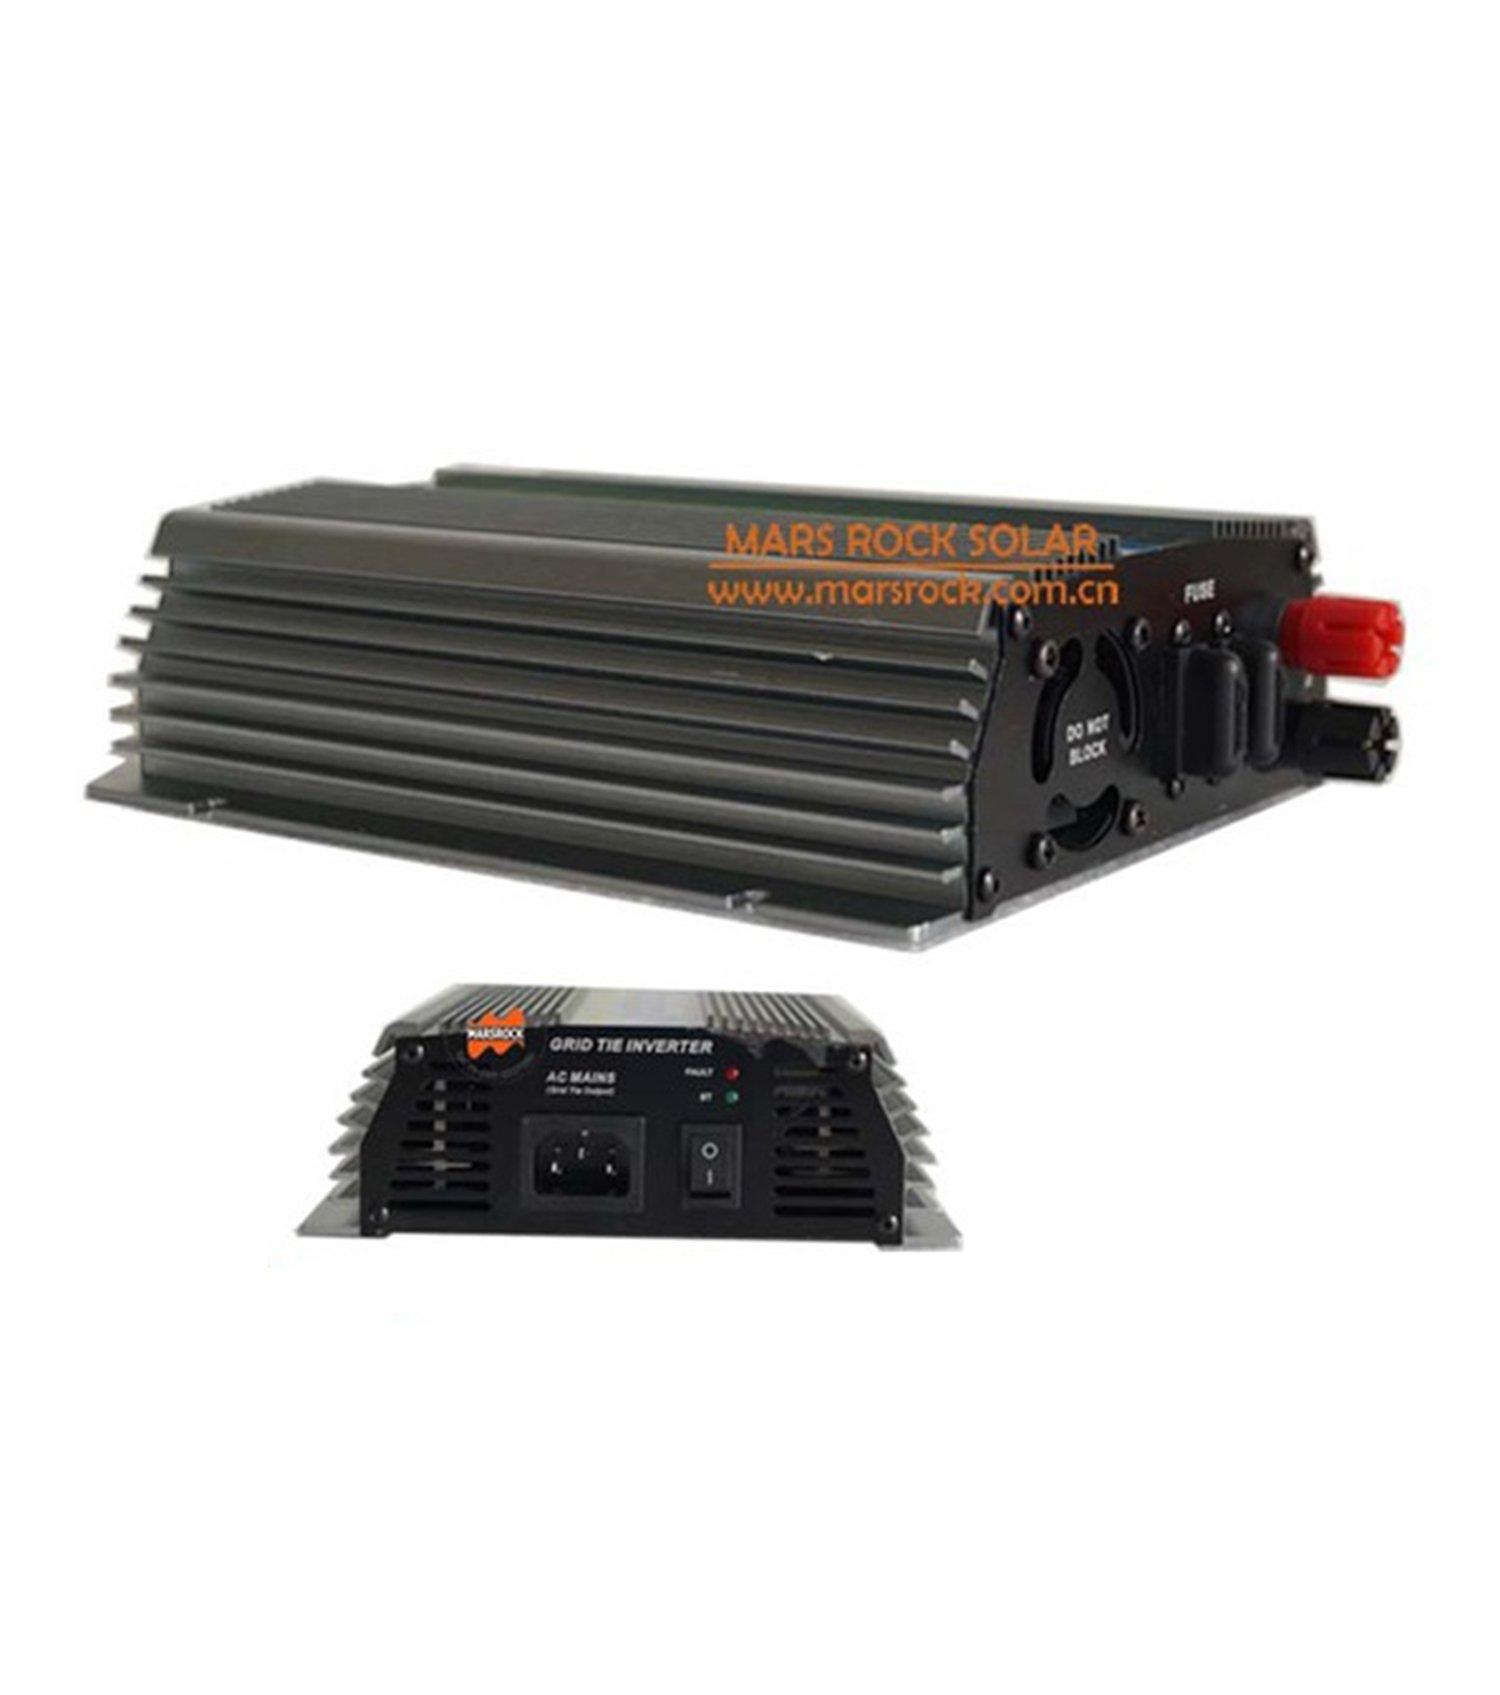 MarsRock Power 600W Grid Tie Micro Inverter, 10.5-28V DC to AC 110/220V Pure Sine Wave Inverter Suitable for 18V PV module or Wind Turbine (AC110Volt 60Hz Silver)